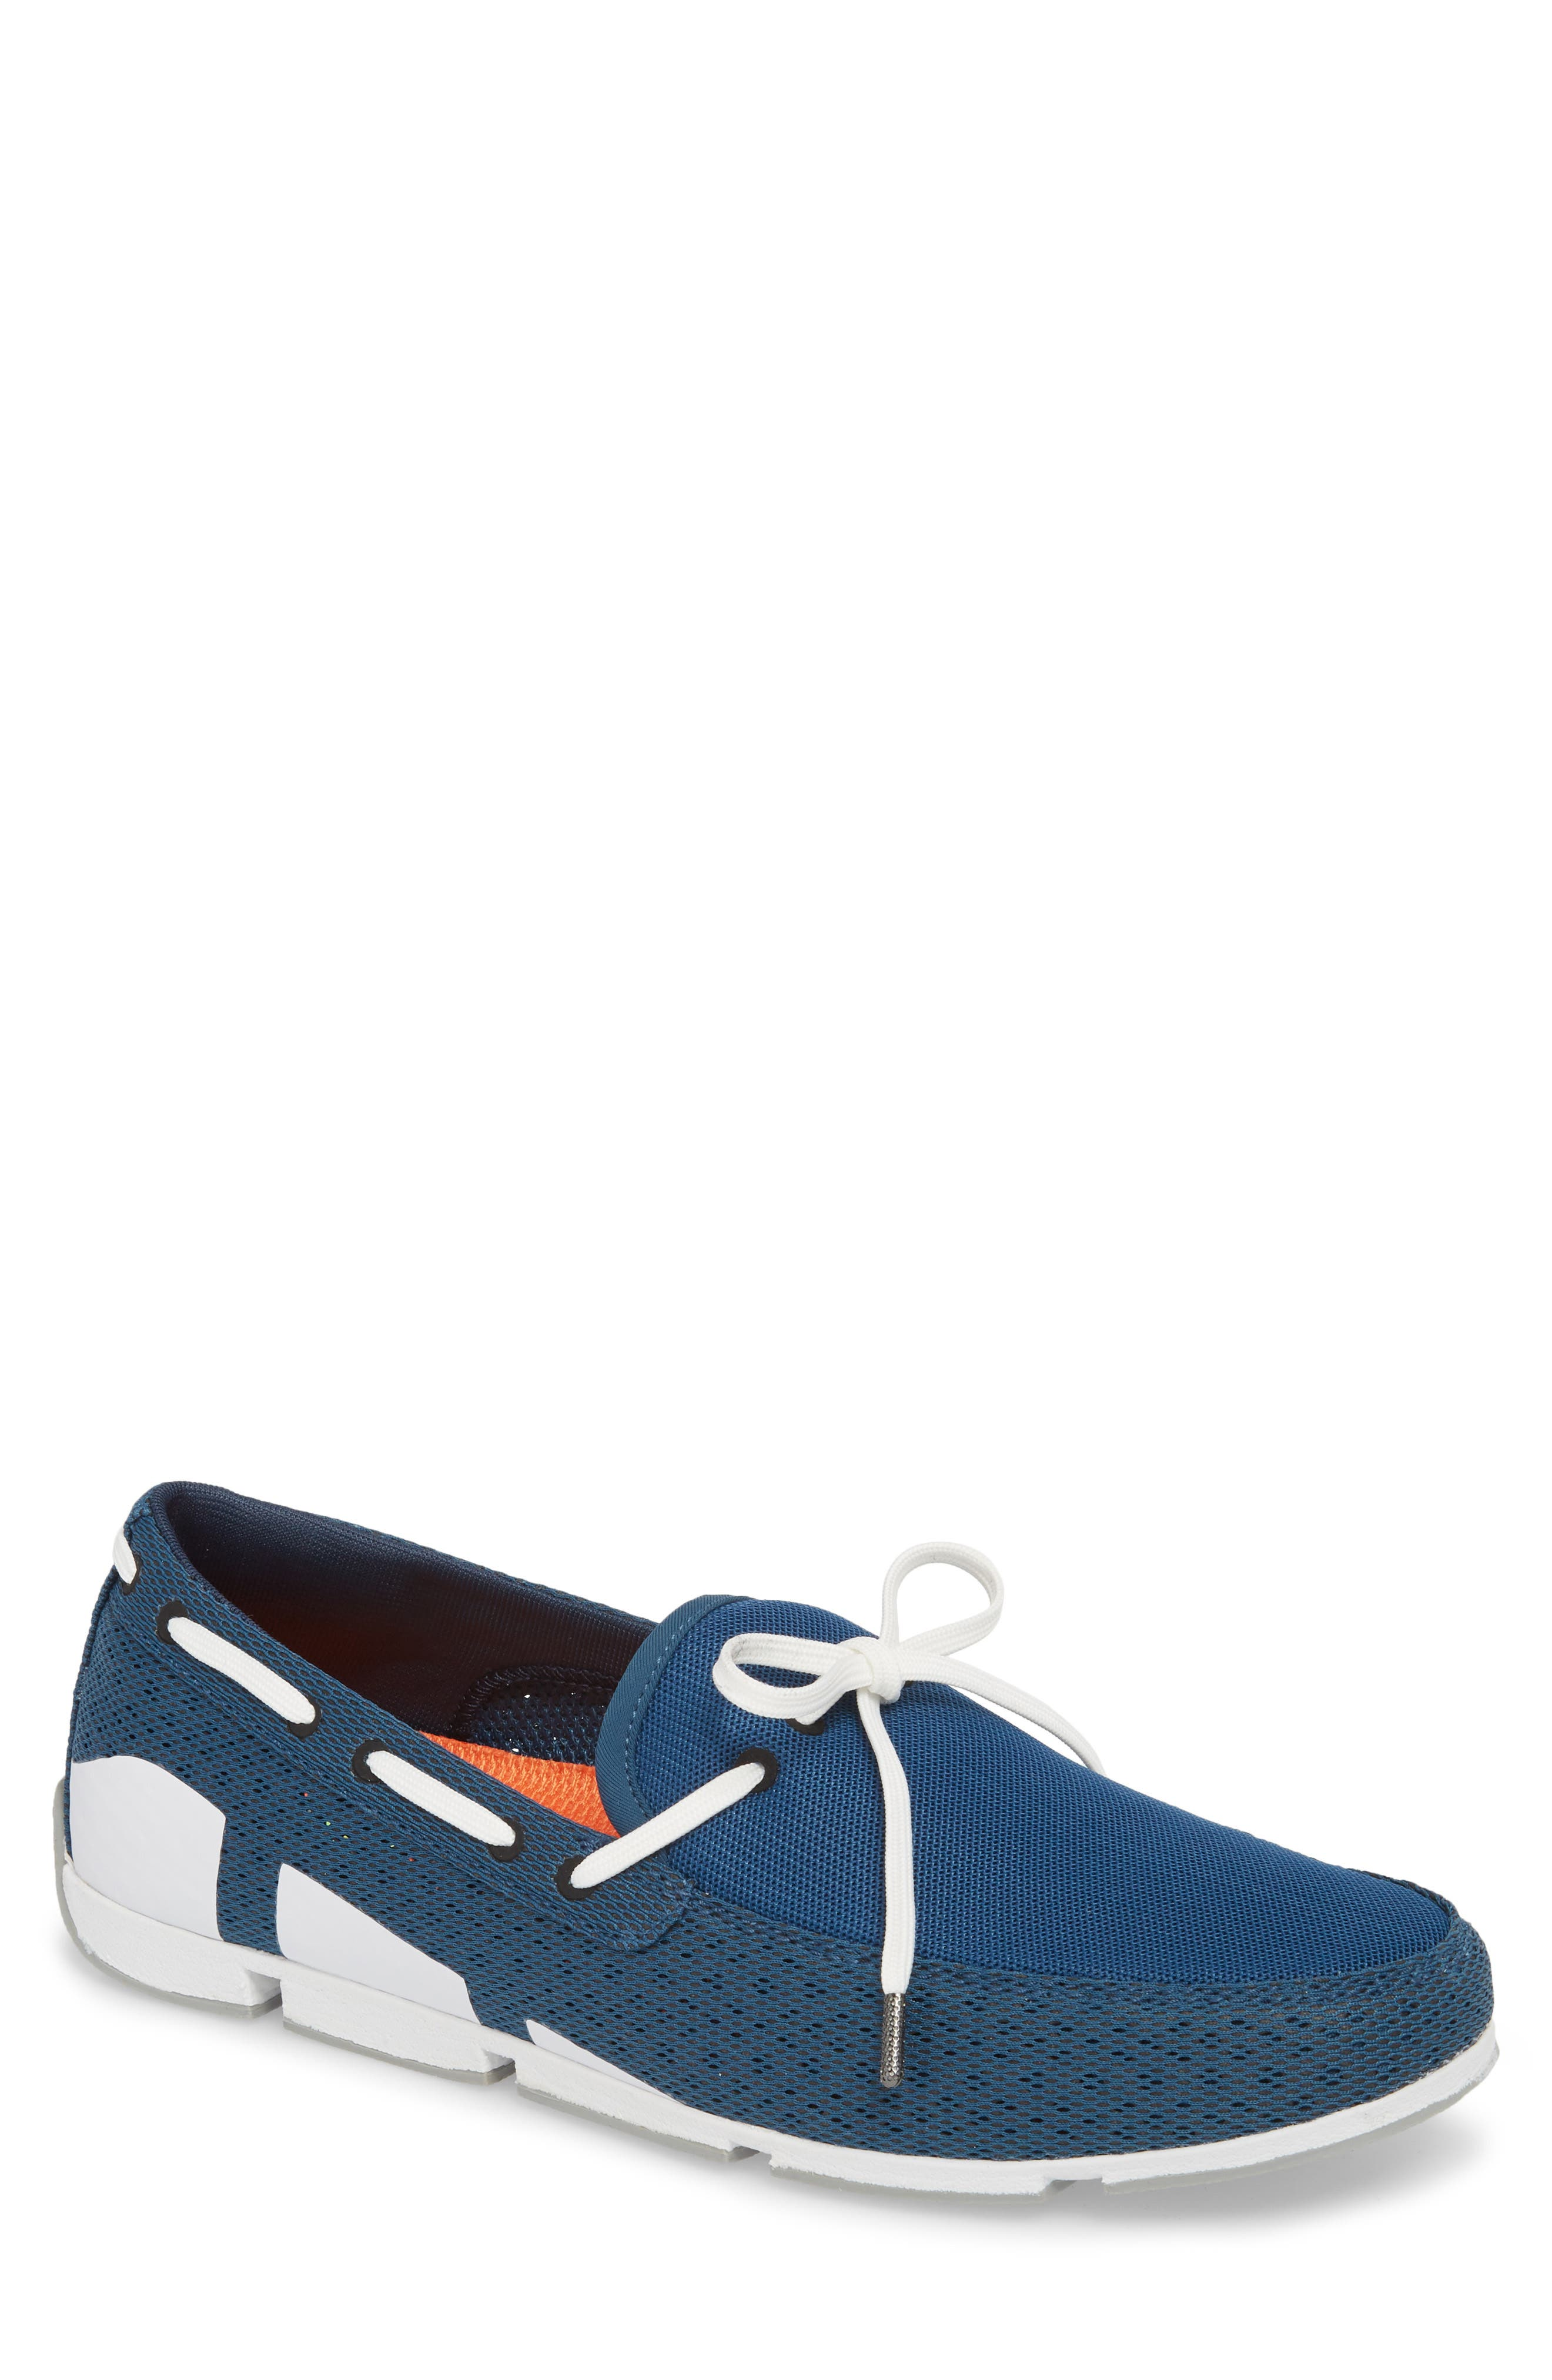 Breeze Loafer,                             Main thumbnail 1, color,                             Blue/ White